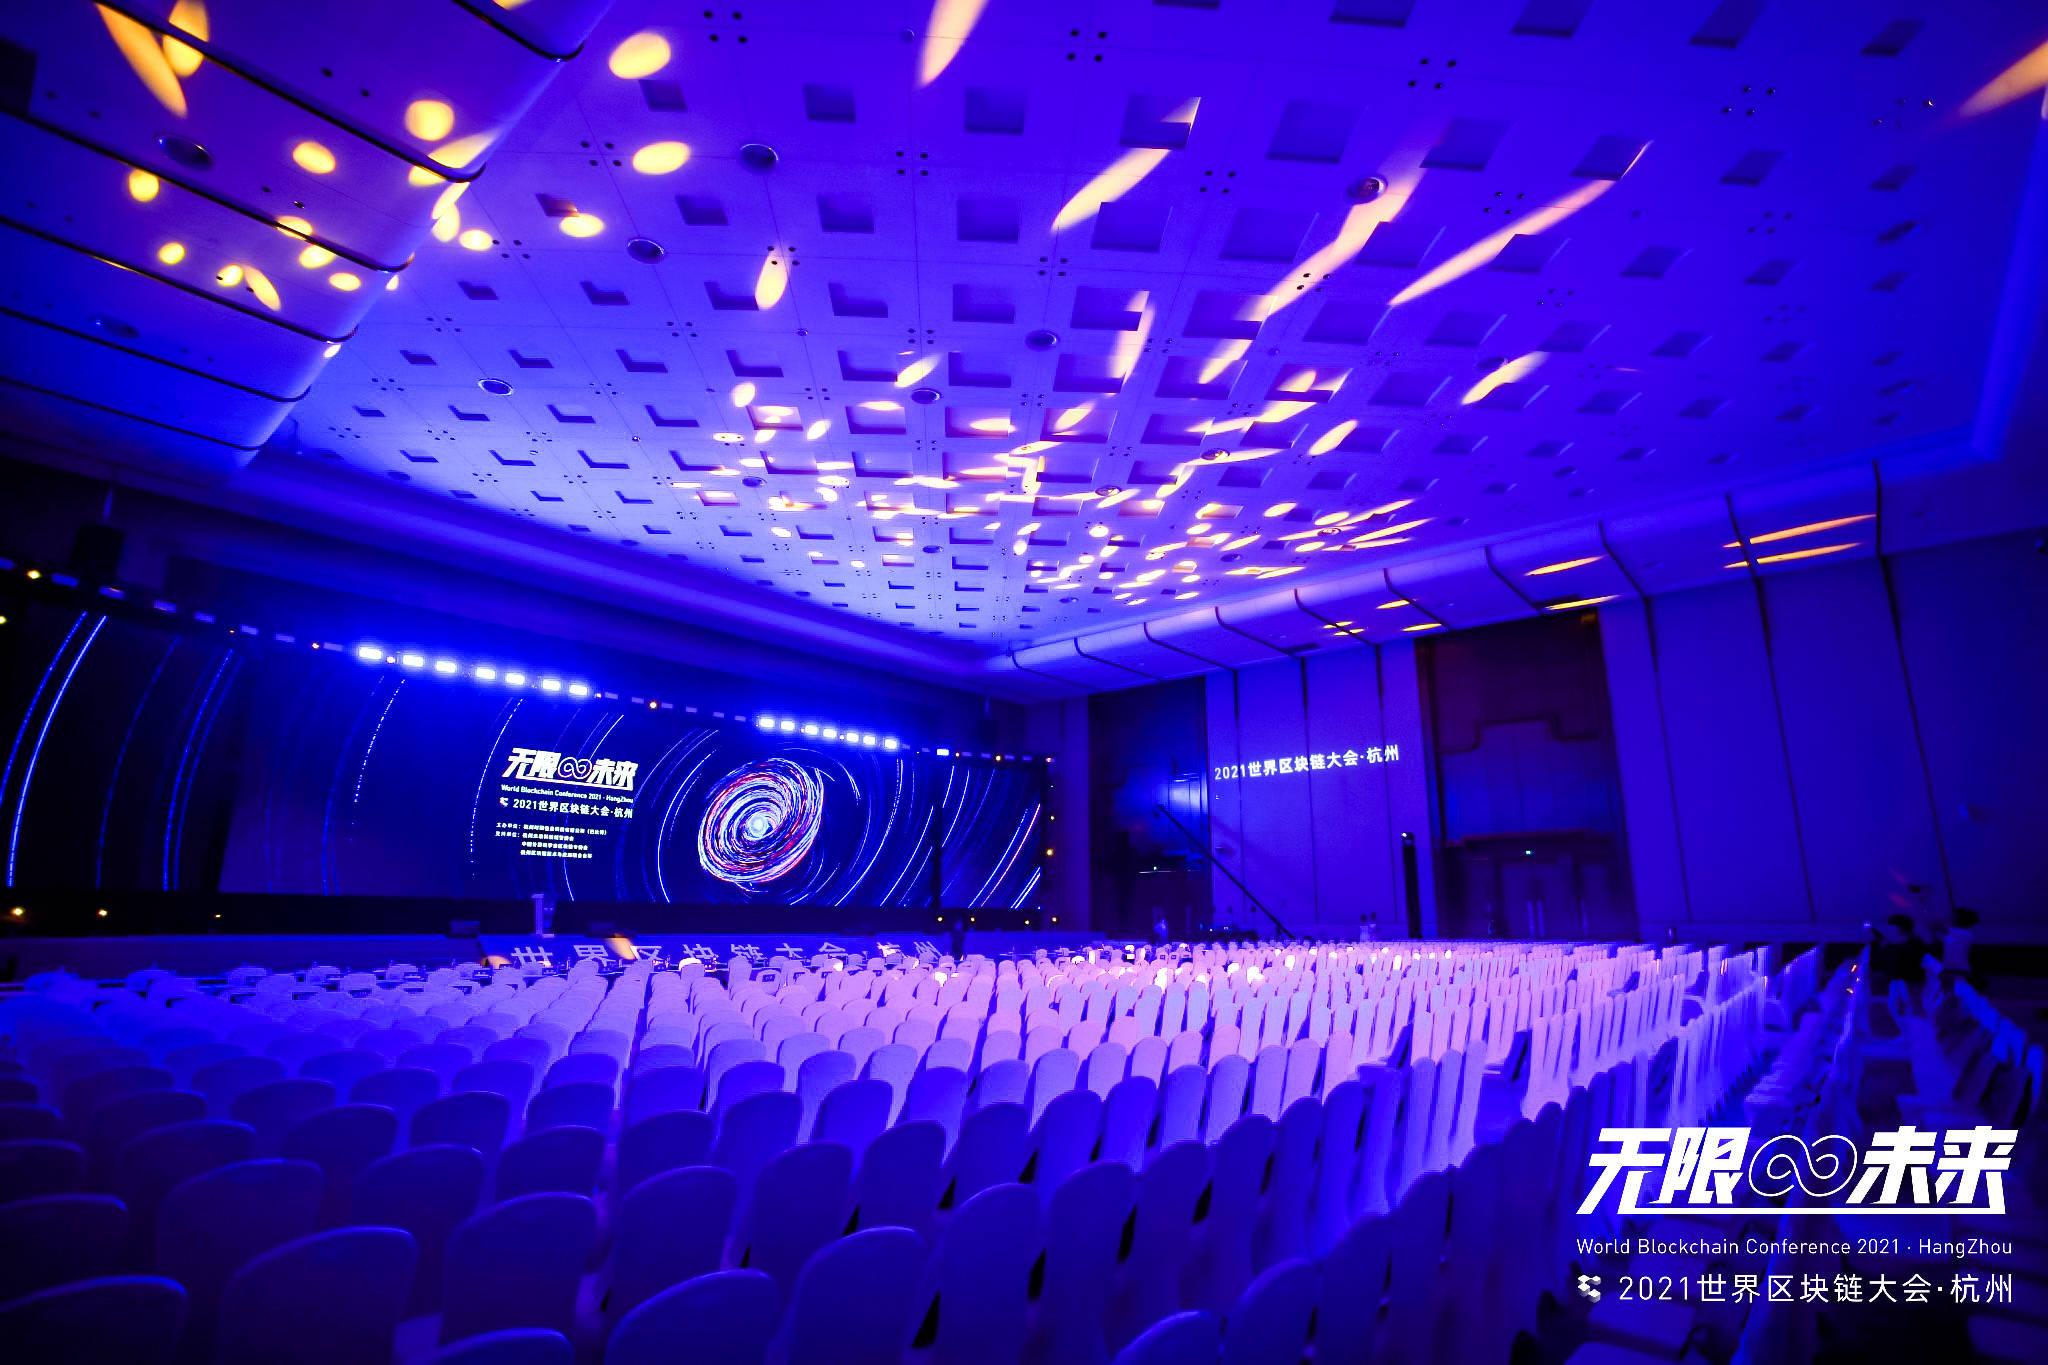 Firefly萤火虫受邀参与2021世界区块链大会|回顾